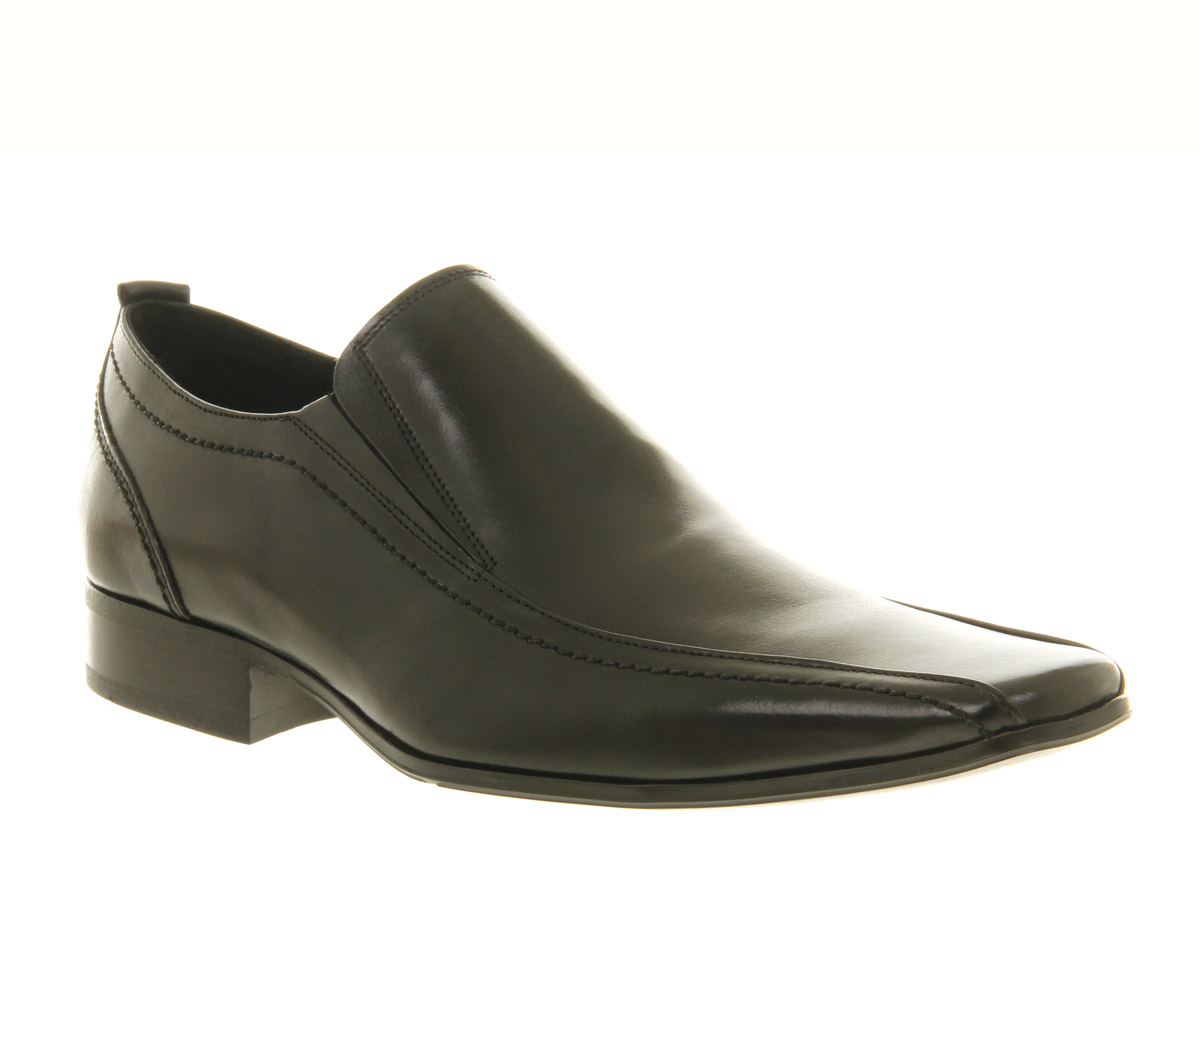 mens office lincoln loafer black leather formal shoes ebay